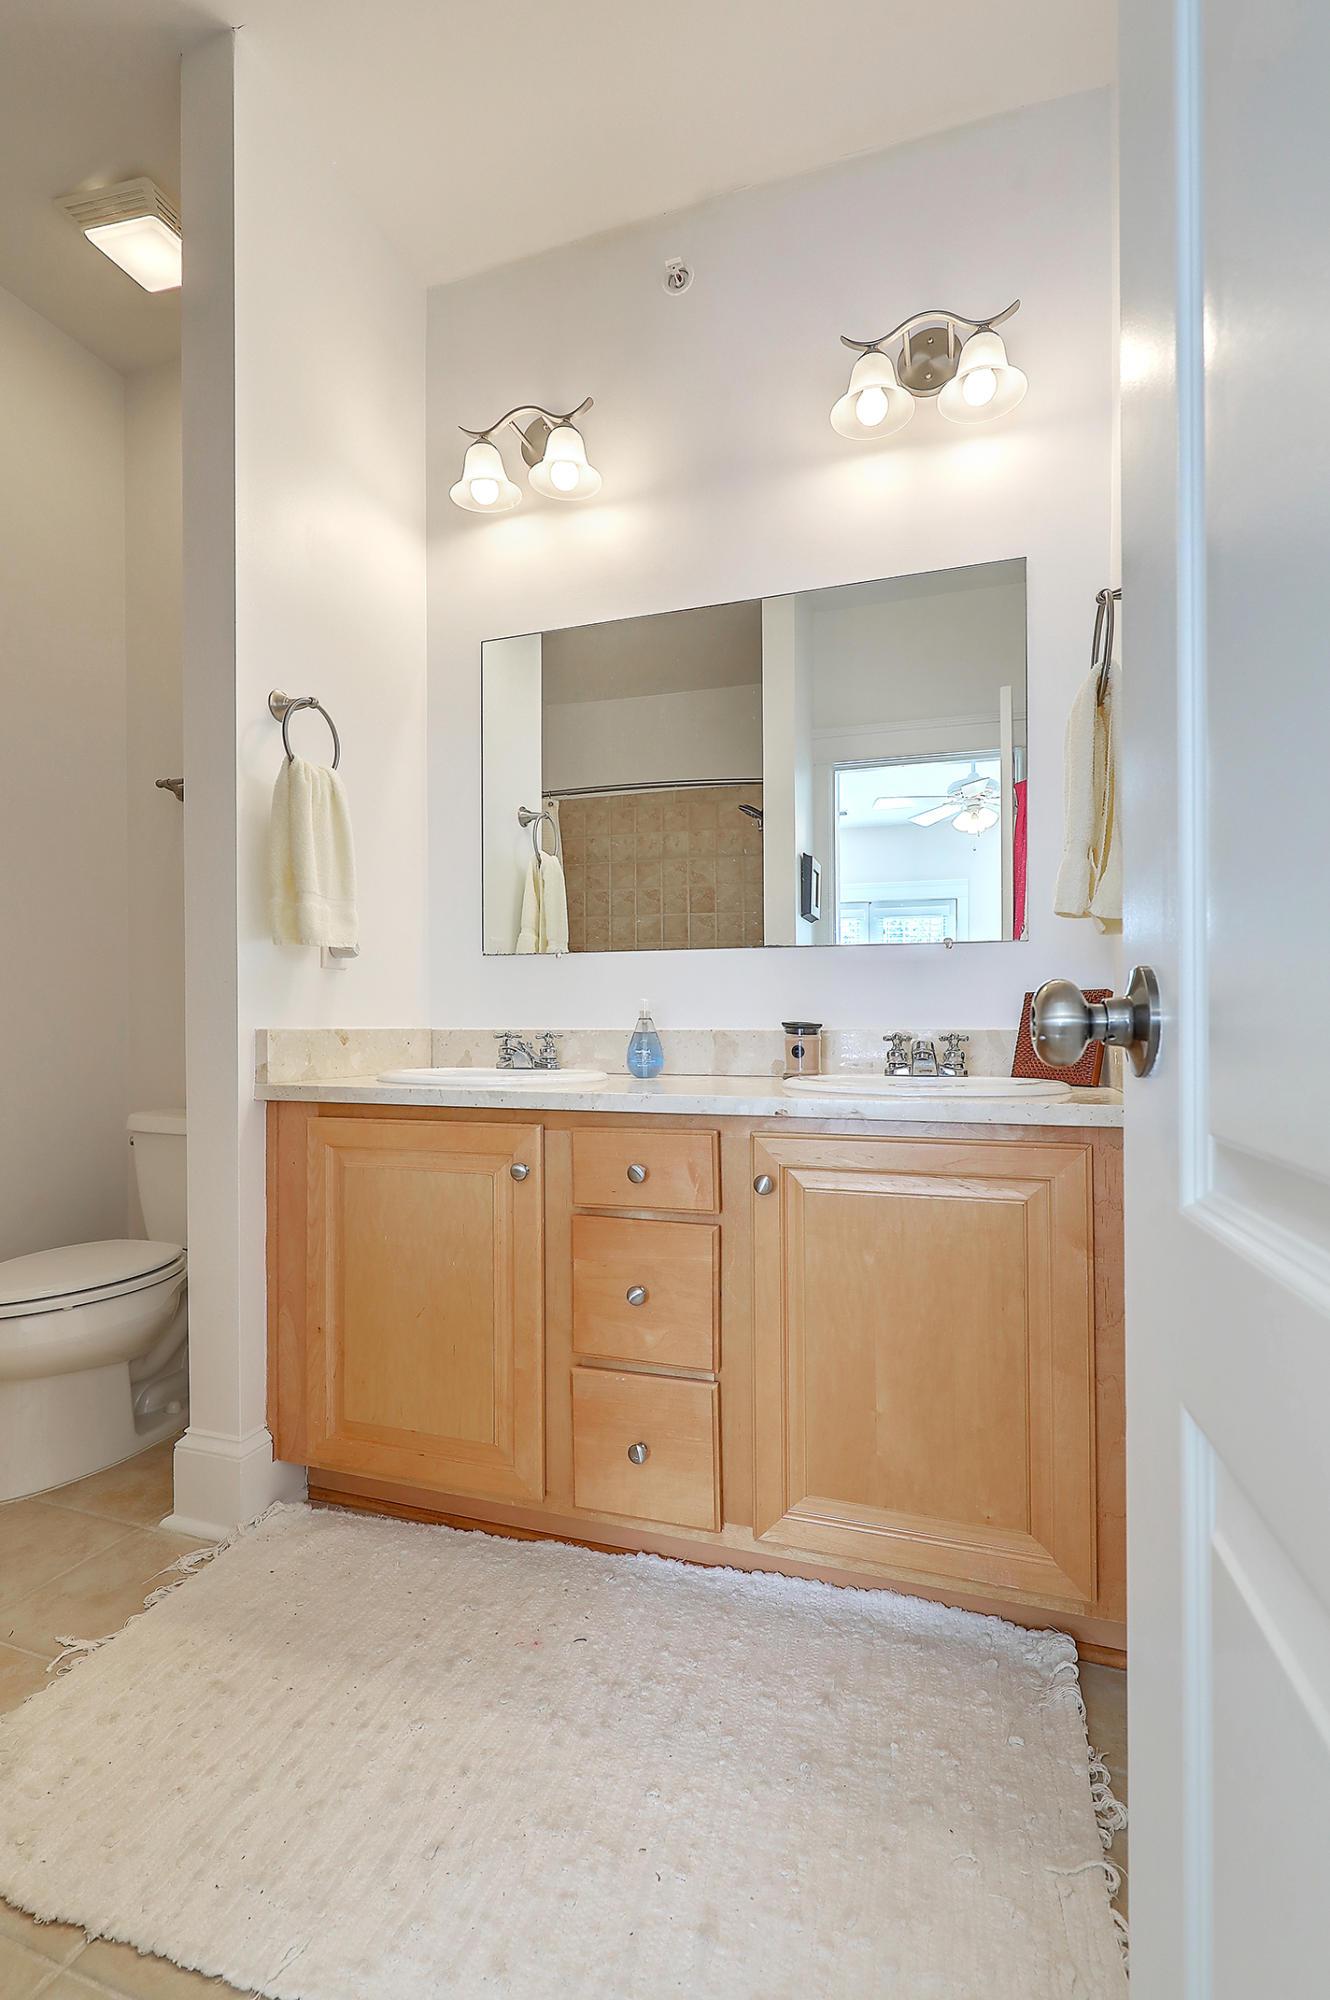 Etiwan Pointe Homes For Sale - 124 Winding Creek, Mount Pleasant, SC - 13